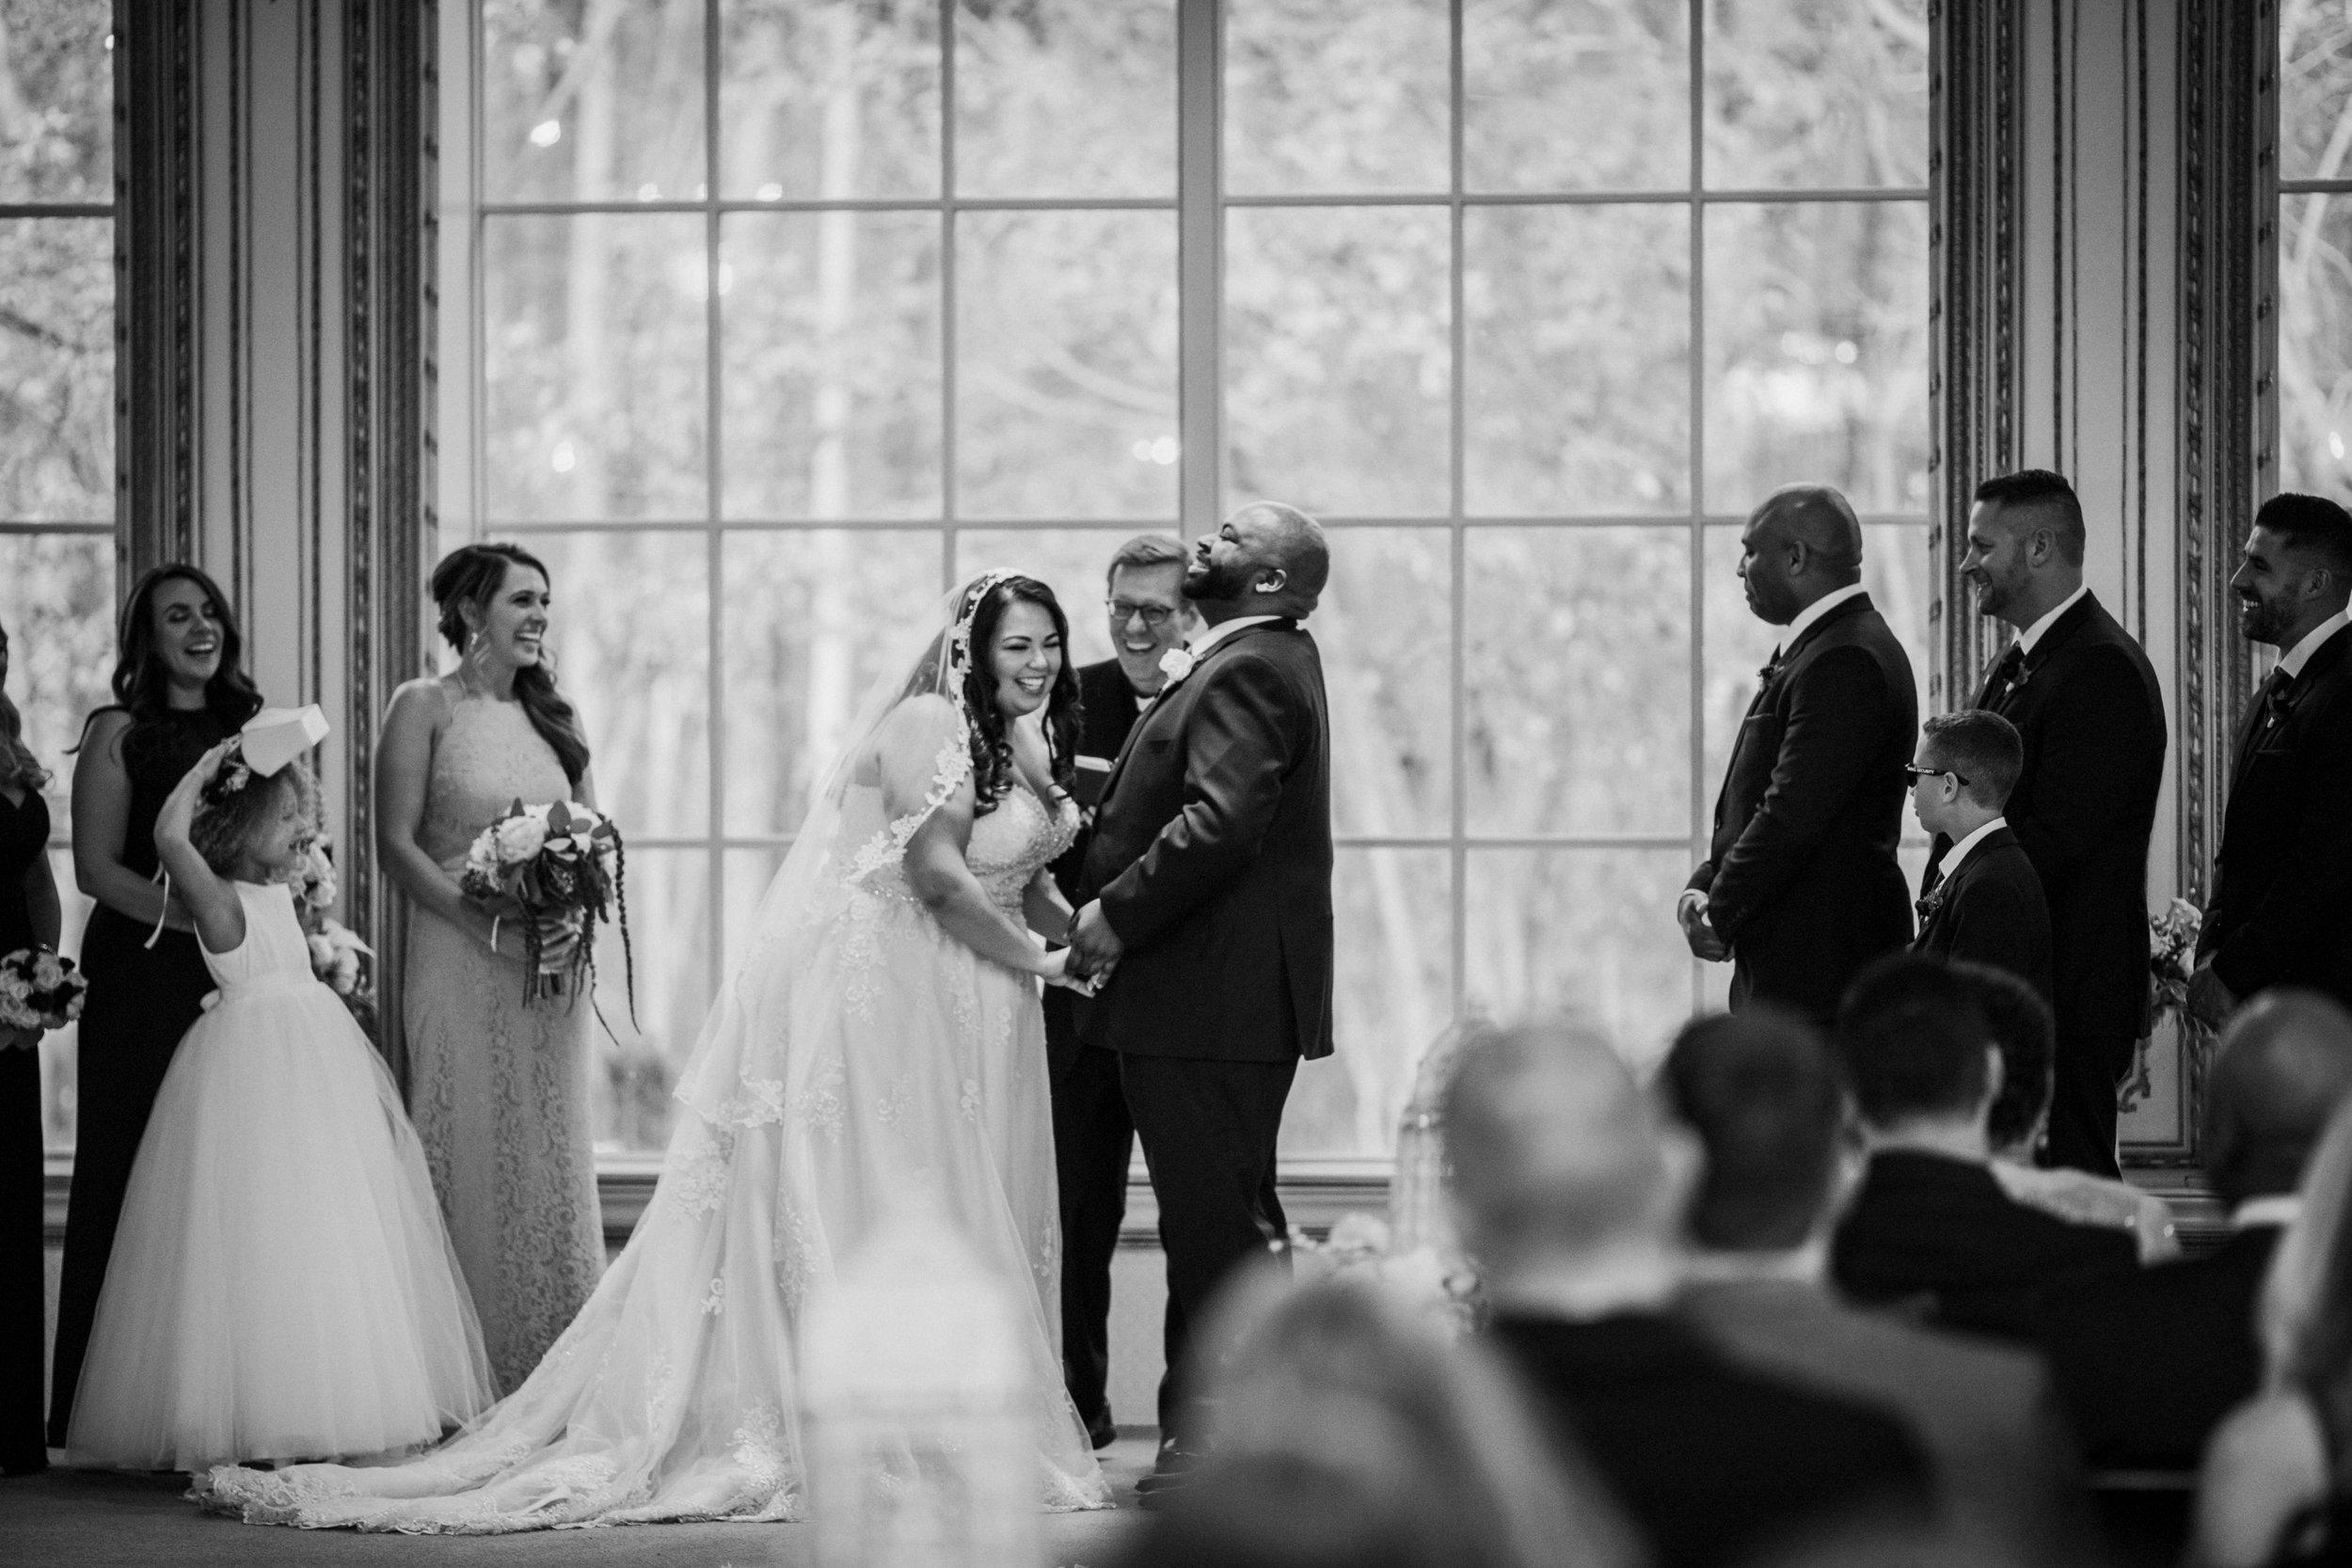 New-Jersey-Wedding-Photography-Brigalias-Deanna&Darryl-CEREMONY-BW-94.jpg